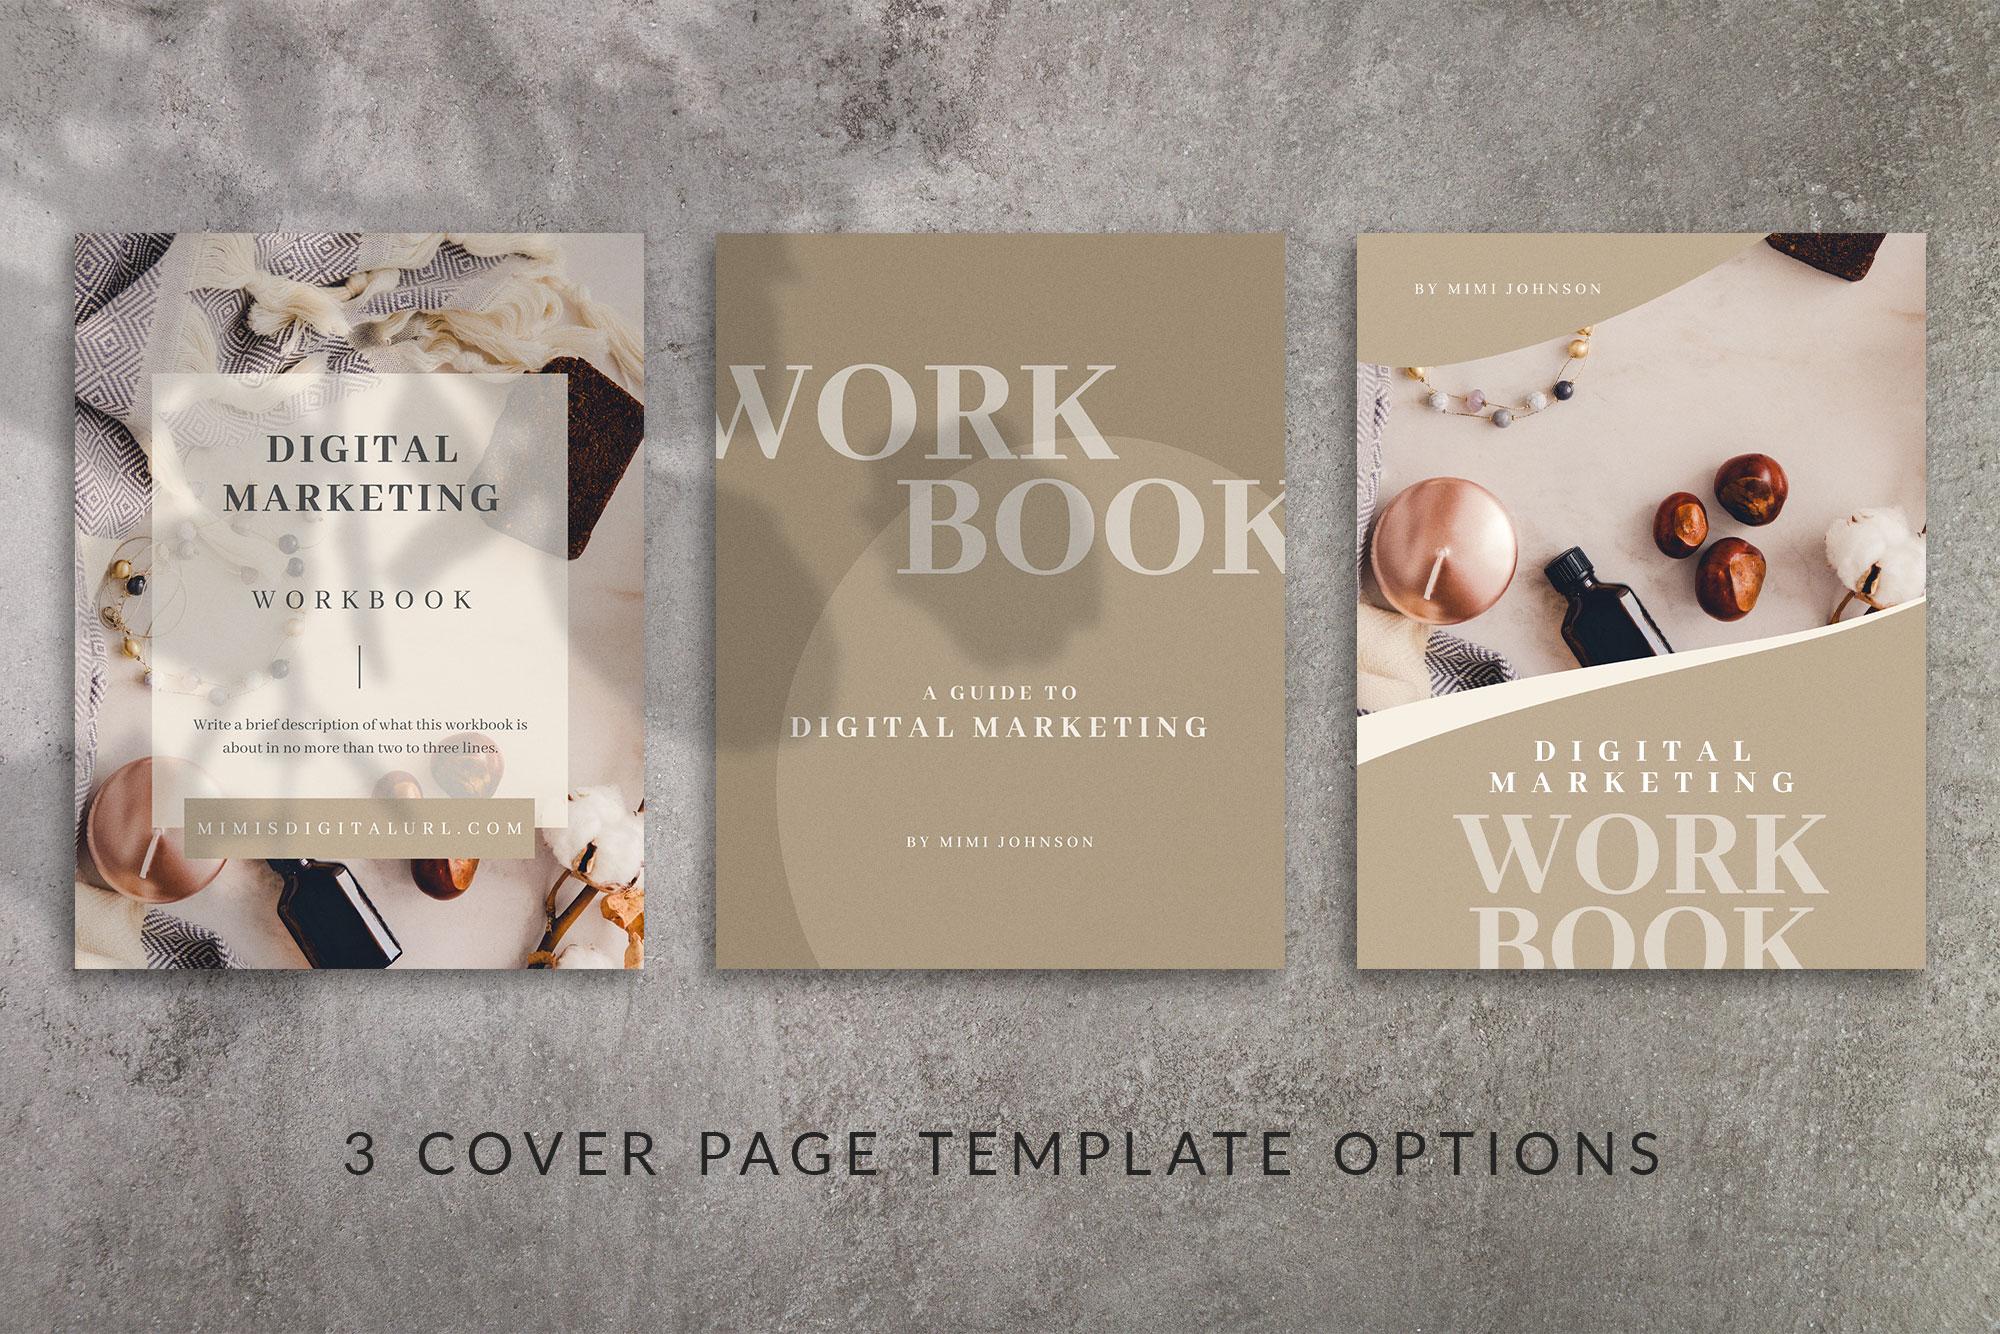 Workbook Canva Template | Mink example image 4